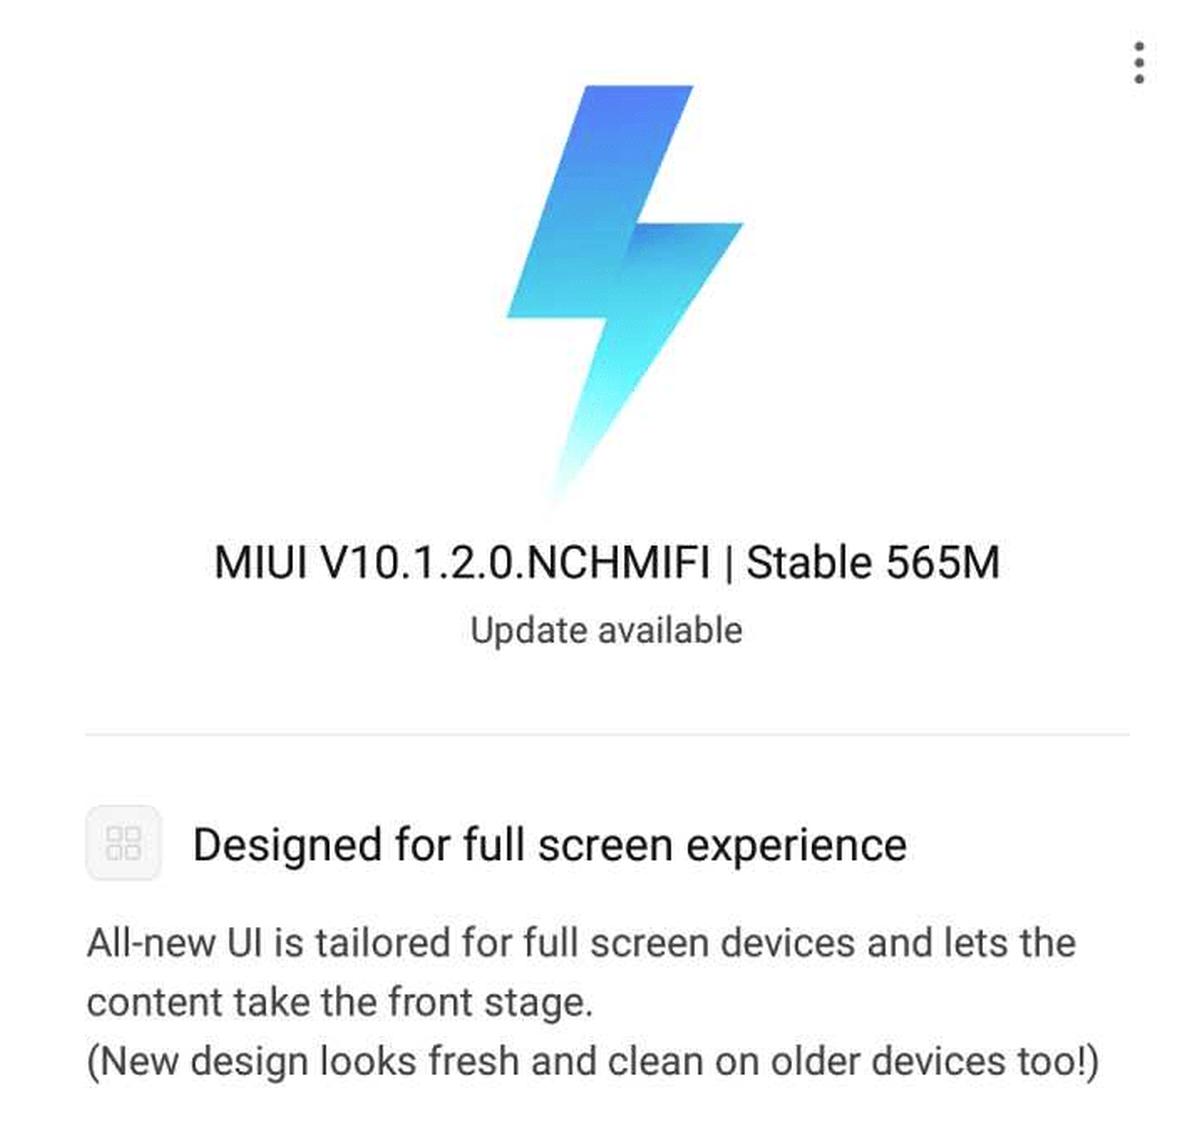 Mi Note 3 MIUI 10